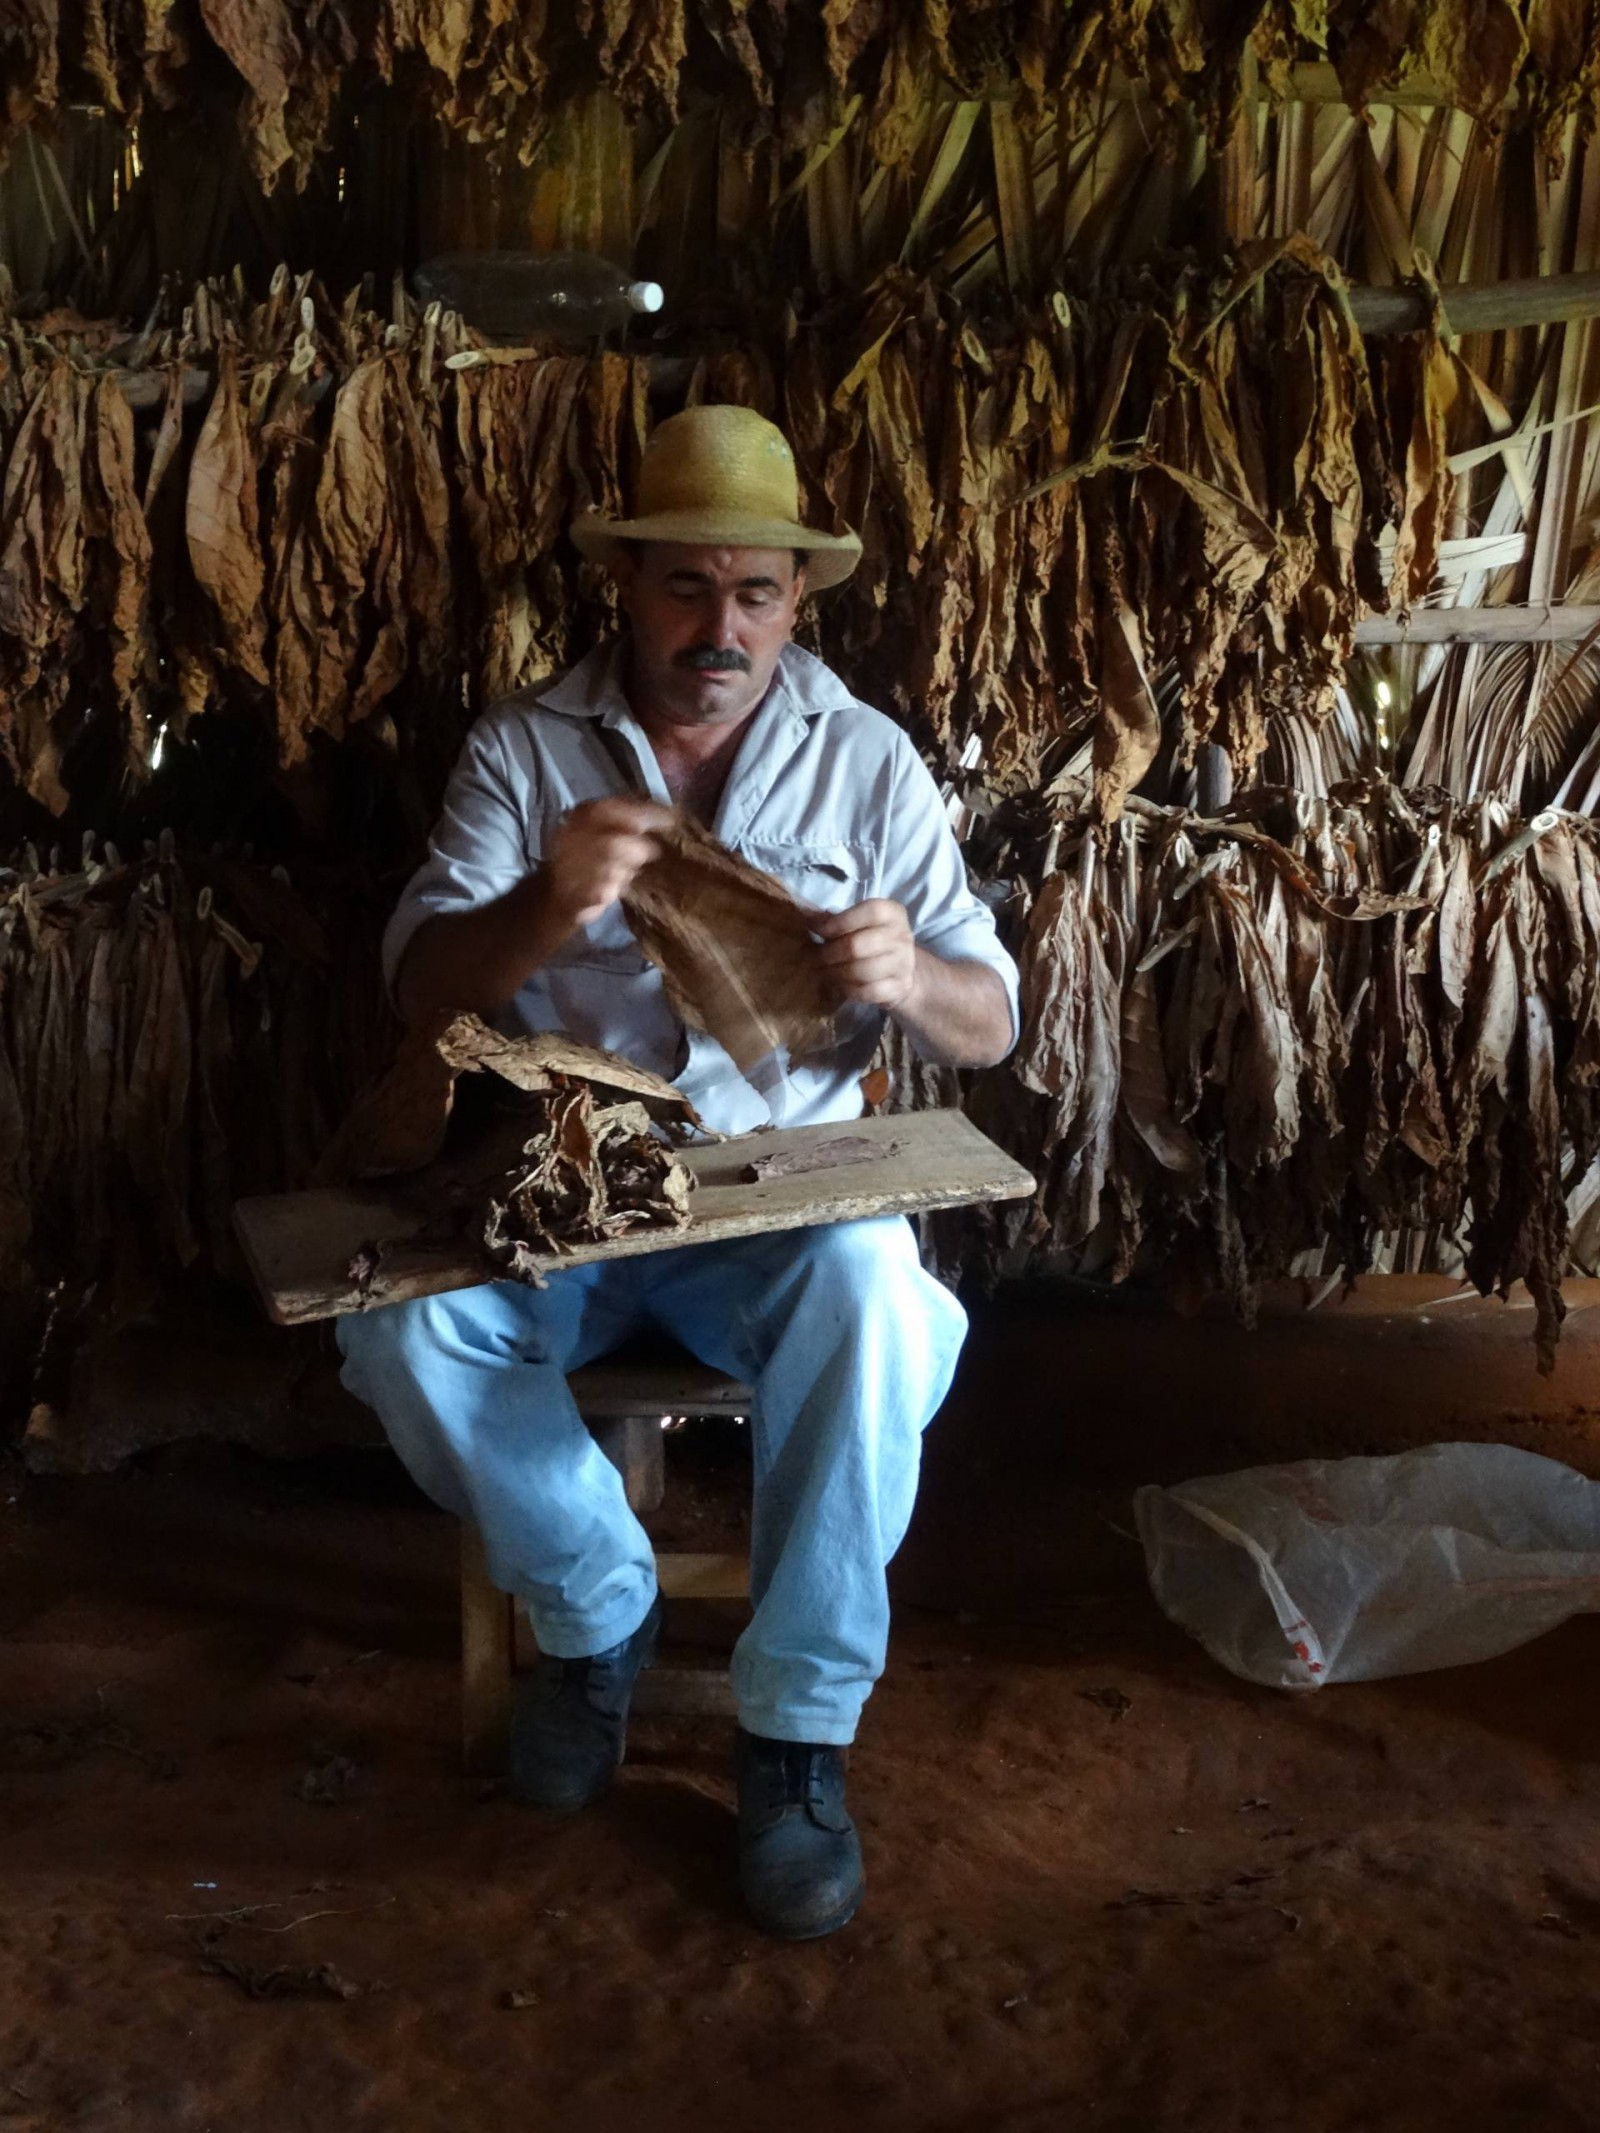 Making cigars in Pinar del Rio